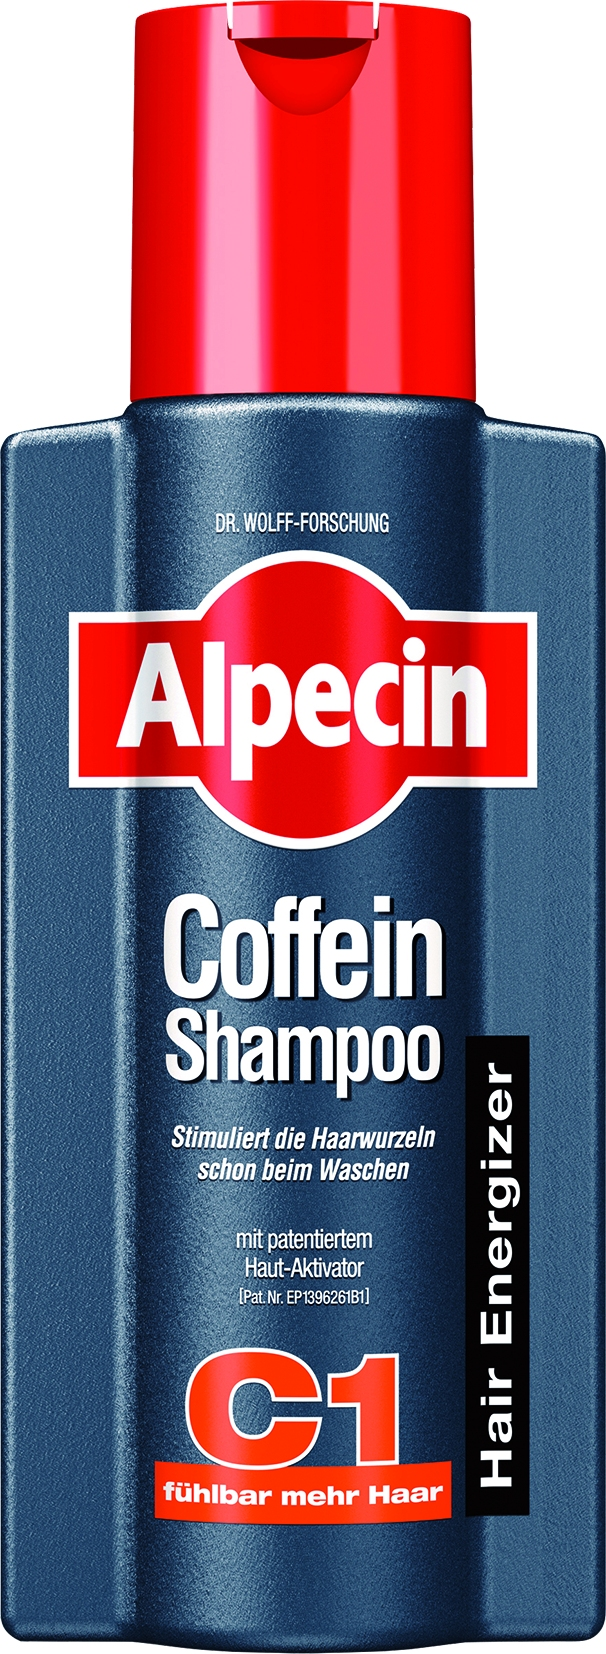 Coffein Shampoo C1